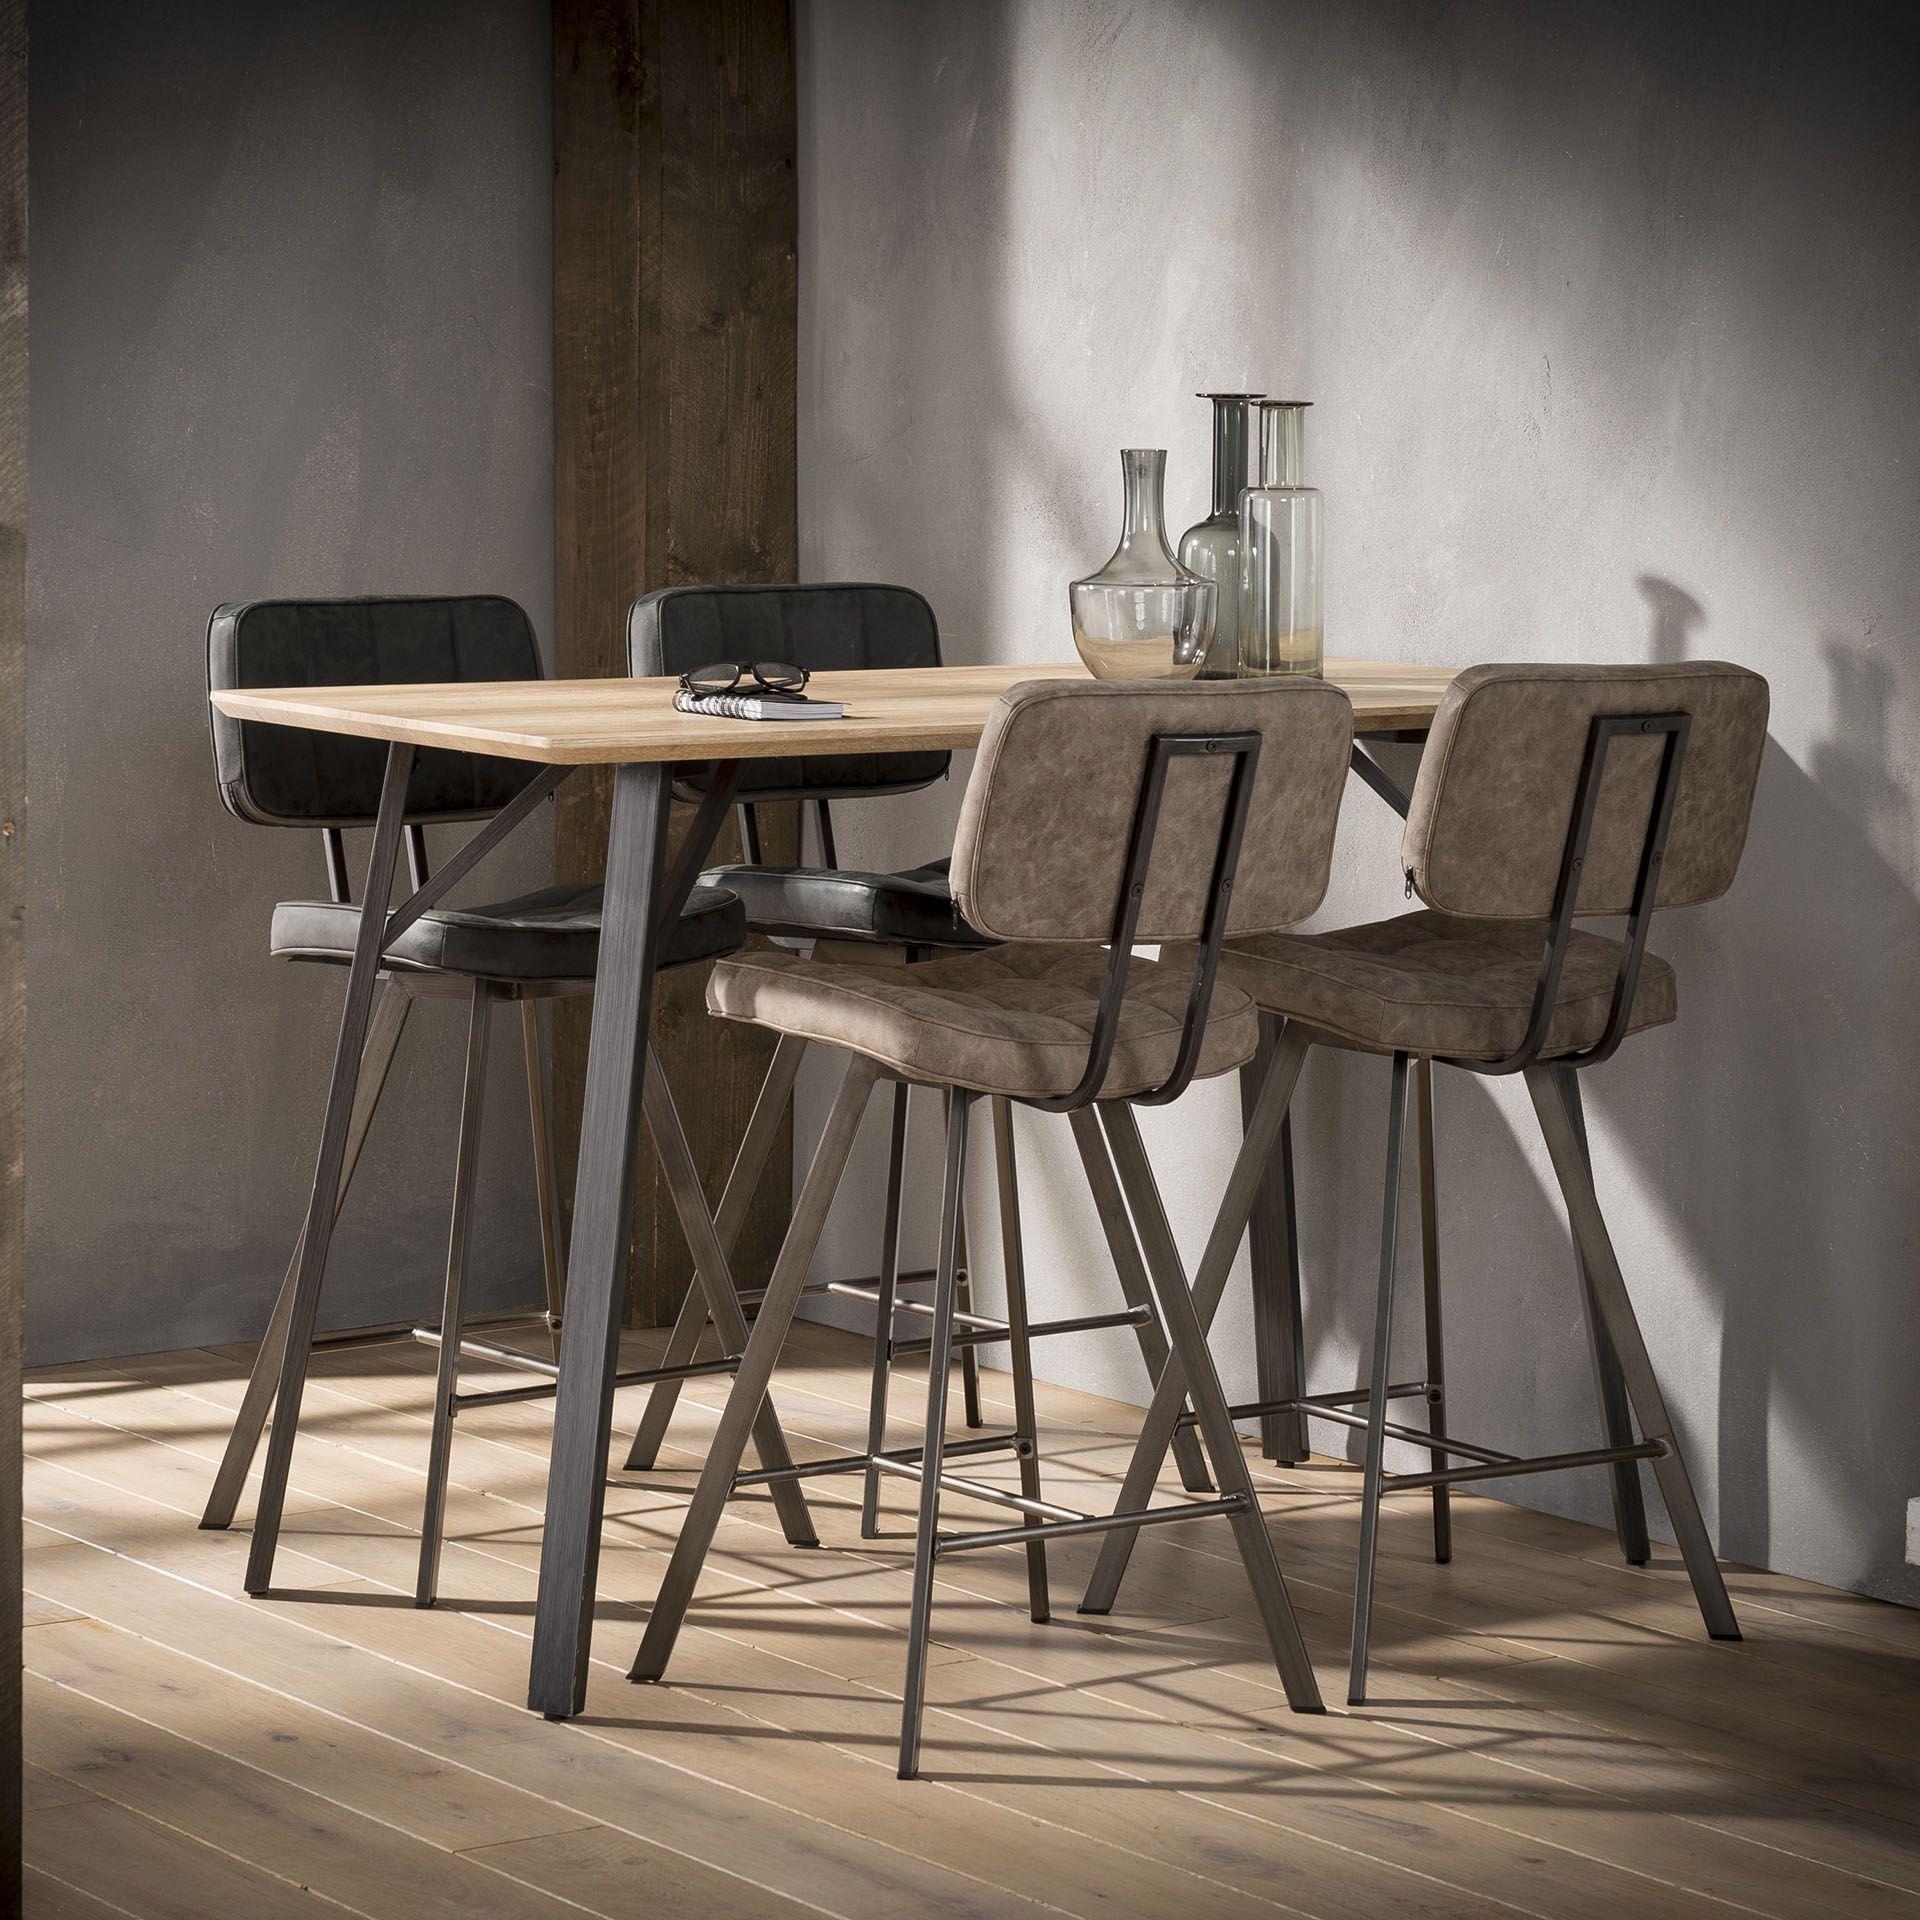 Table Haute Rectangulaire Helsinki Table Bar Cuisine Tabouret De Bar Chaise Bar